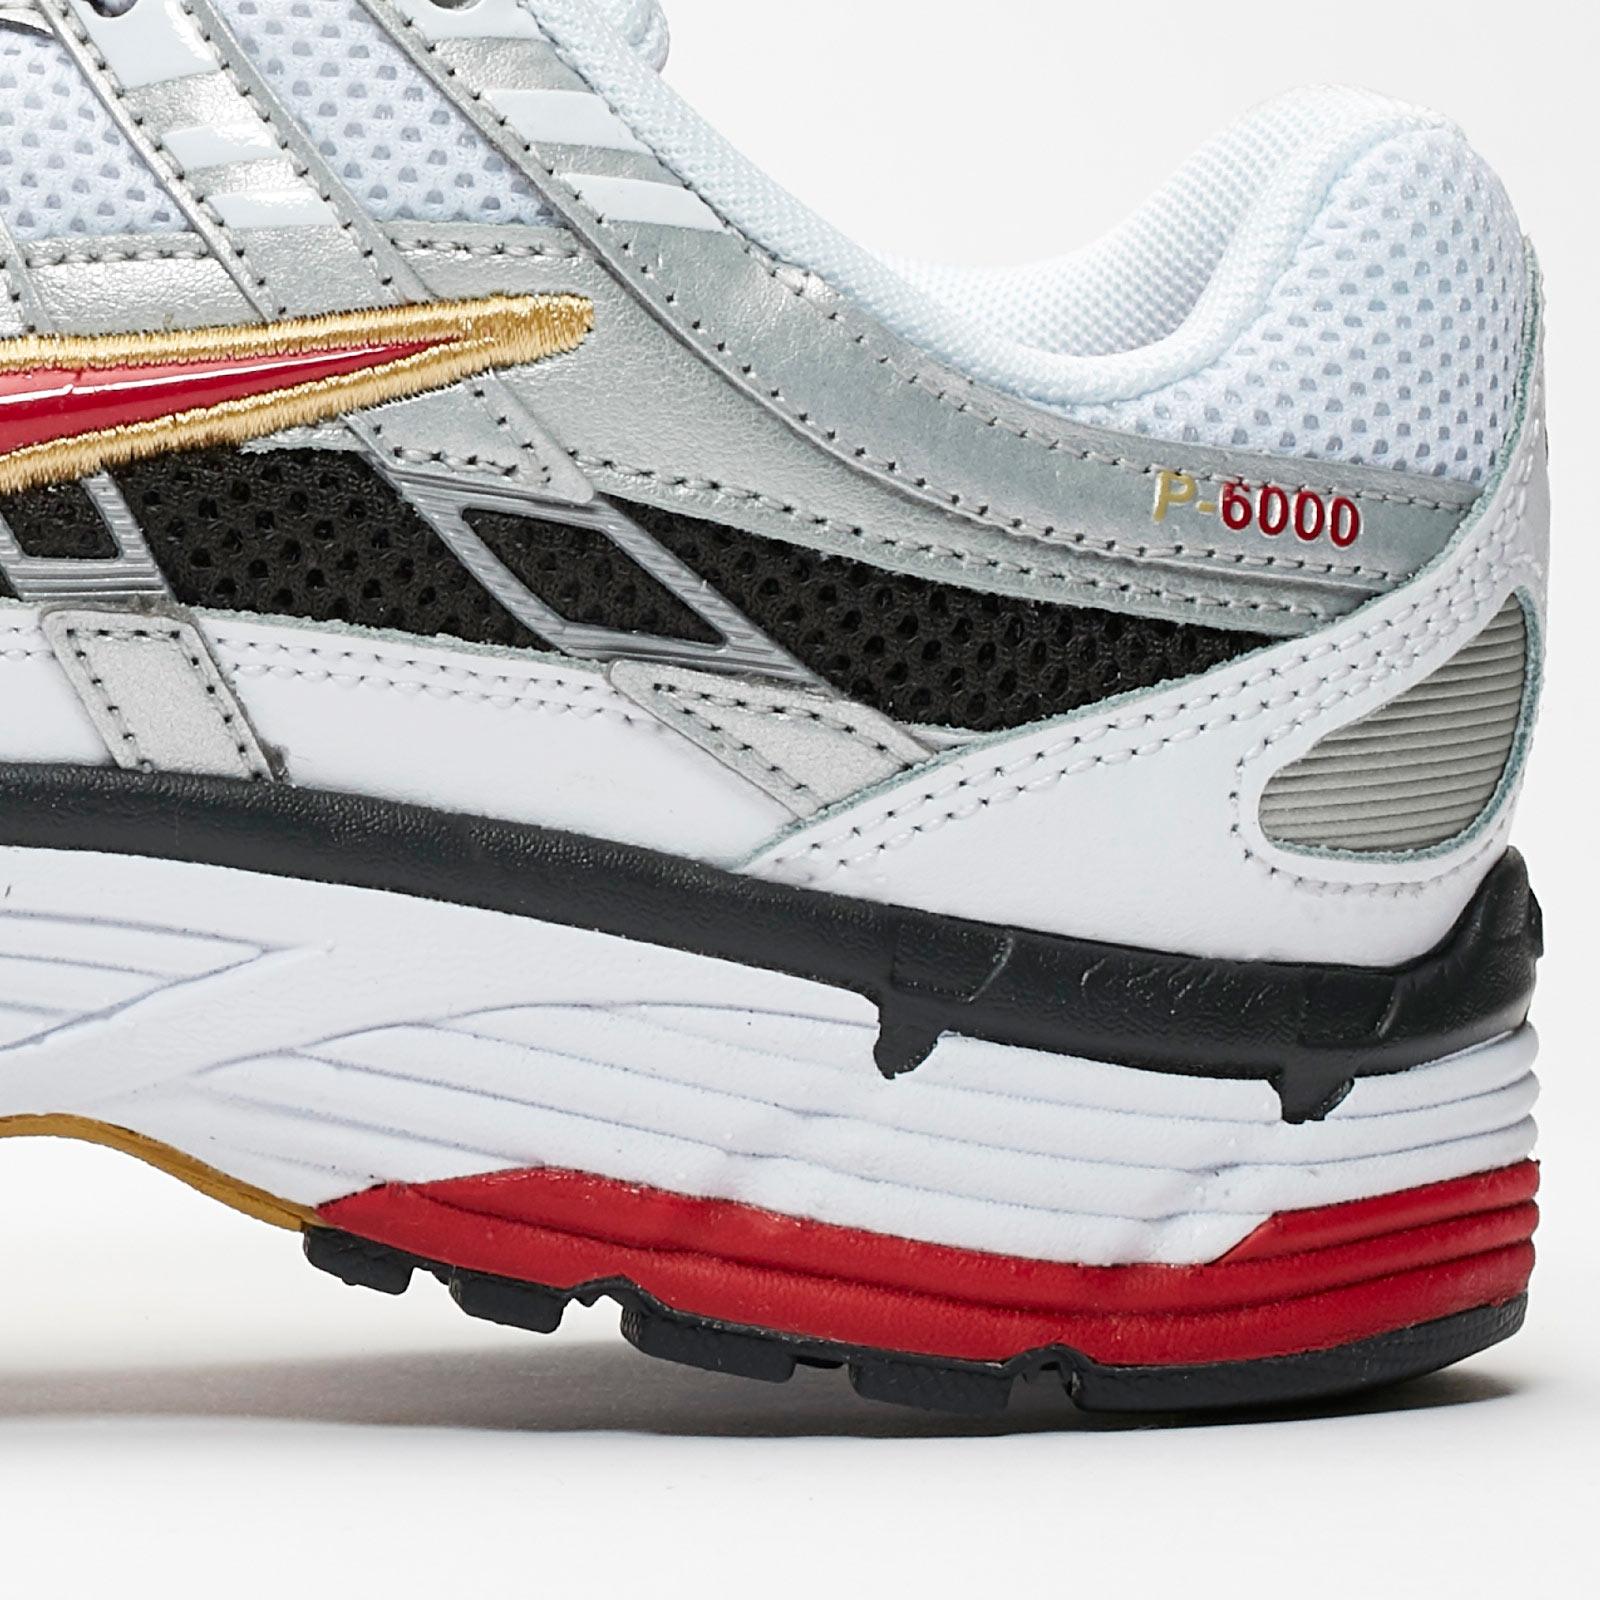 online retailer 7bc9d 214c1 Nike Sportswear Wmns P-6000 - 7. Close